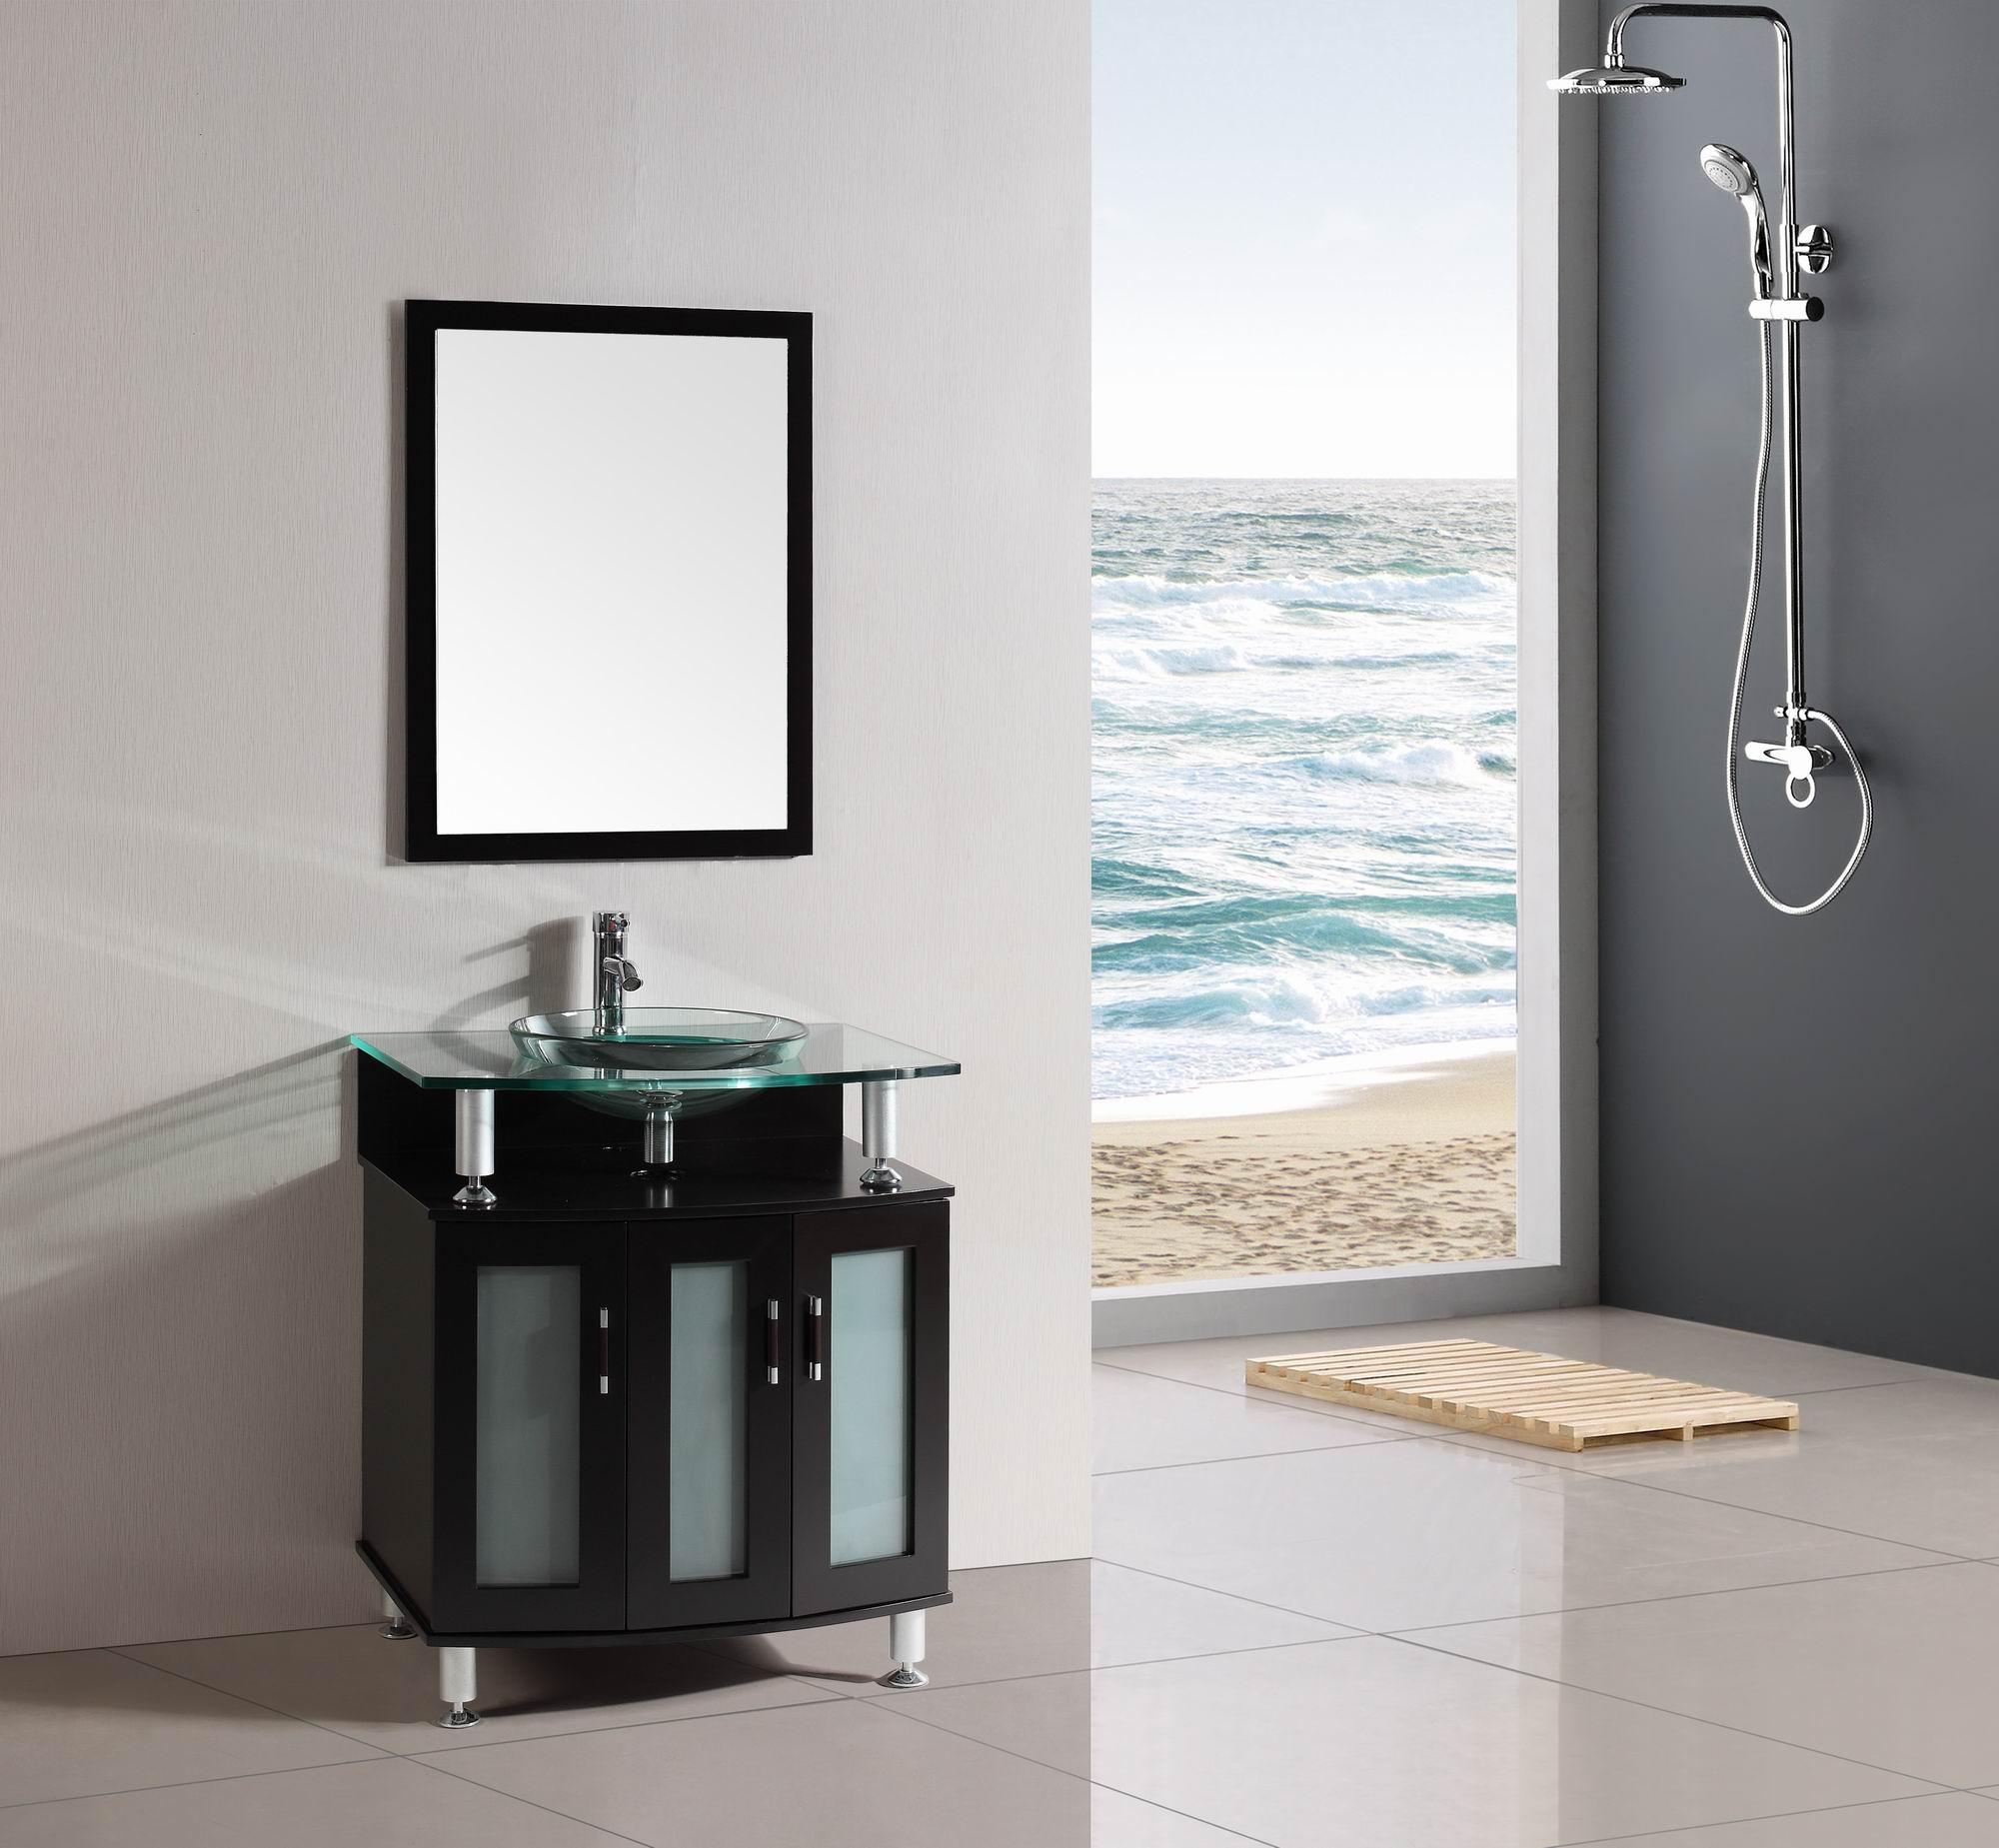 Espresso Finish Vanity Base 21 30 Inches Bathroom Vanities Vanity Cabinets Shop The Best